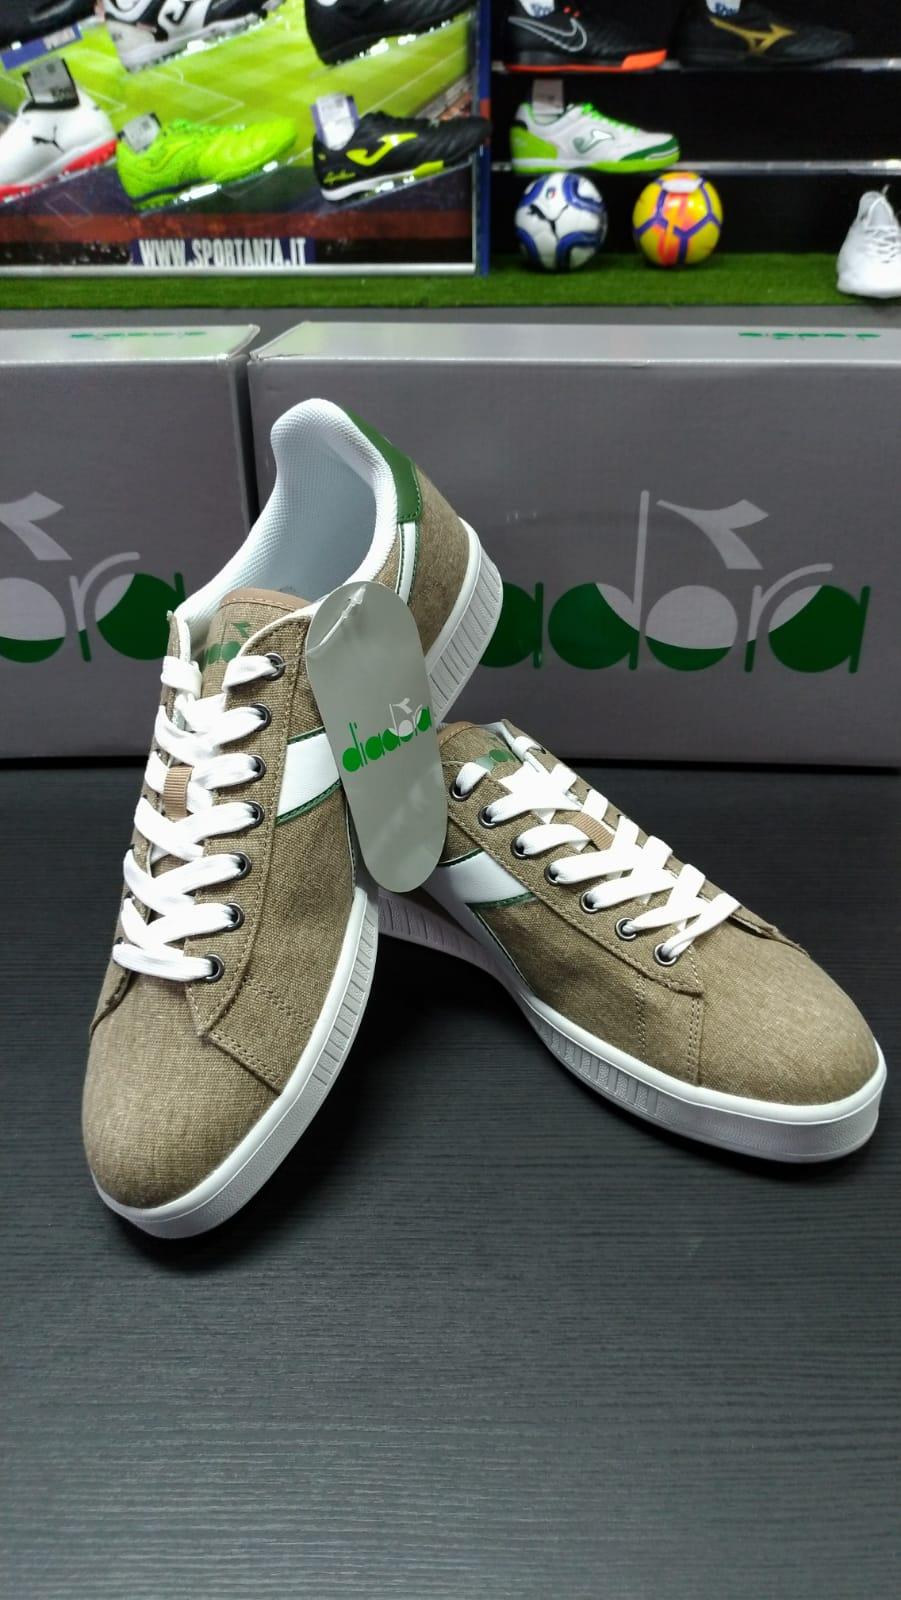 Diadora Scarpe Sneakers Ginnastica Tennis LifeStyle Sportswear Game Canvas